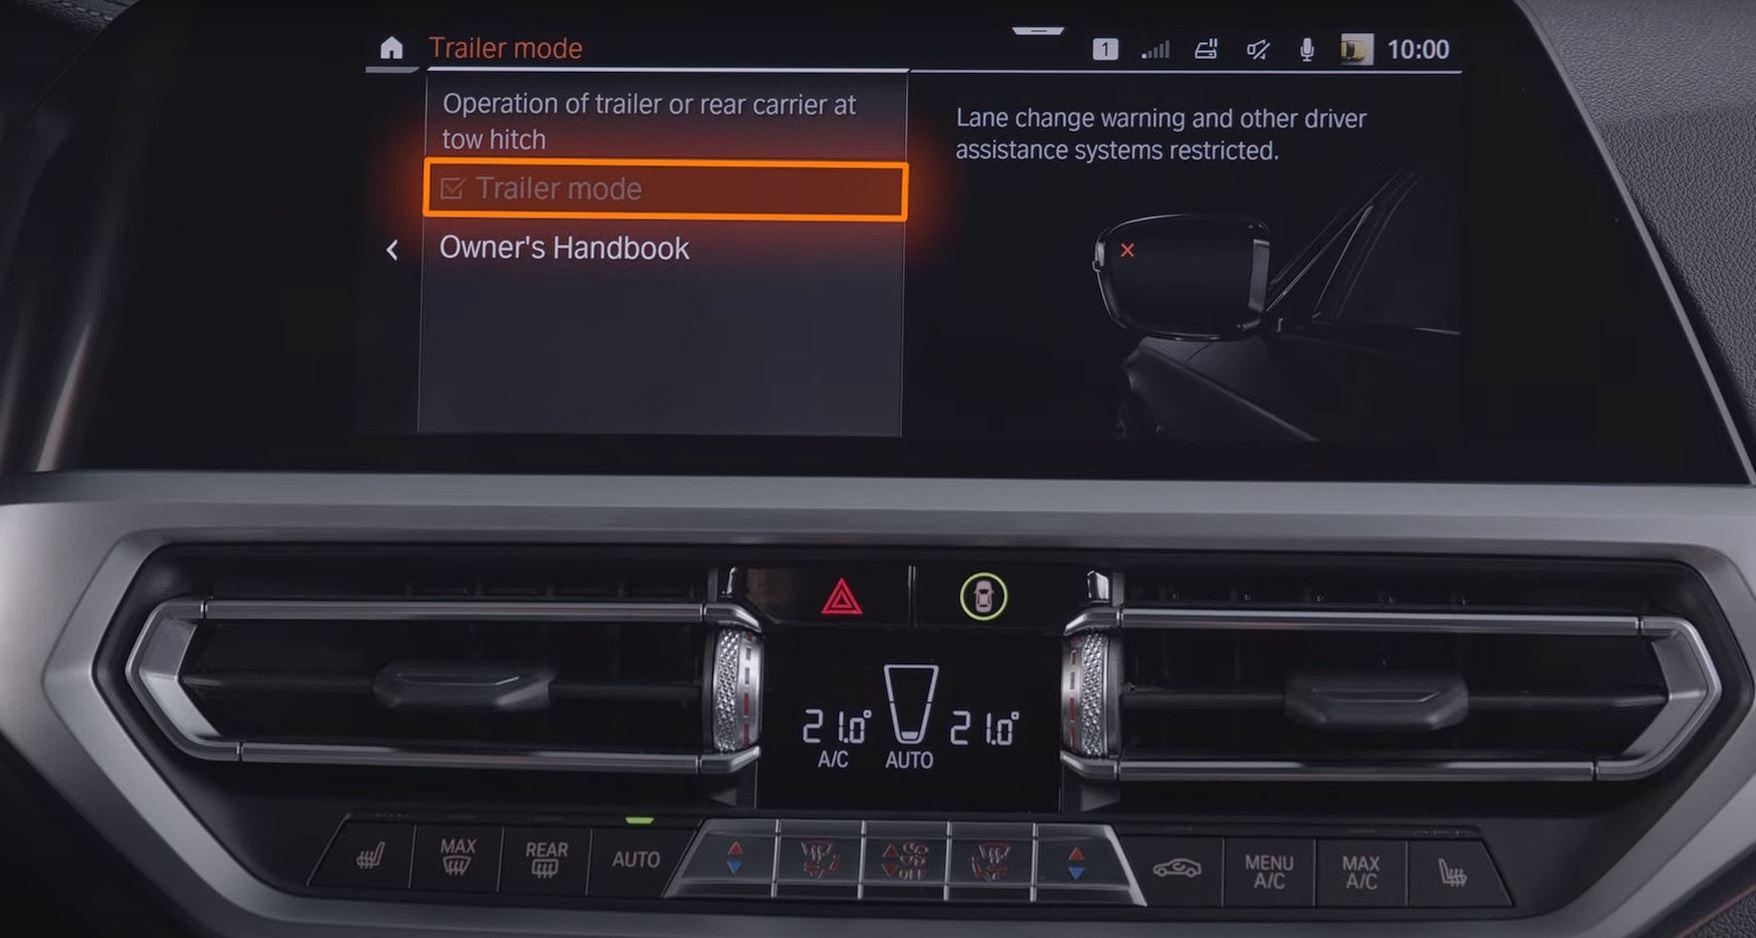 trailer mode